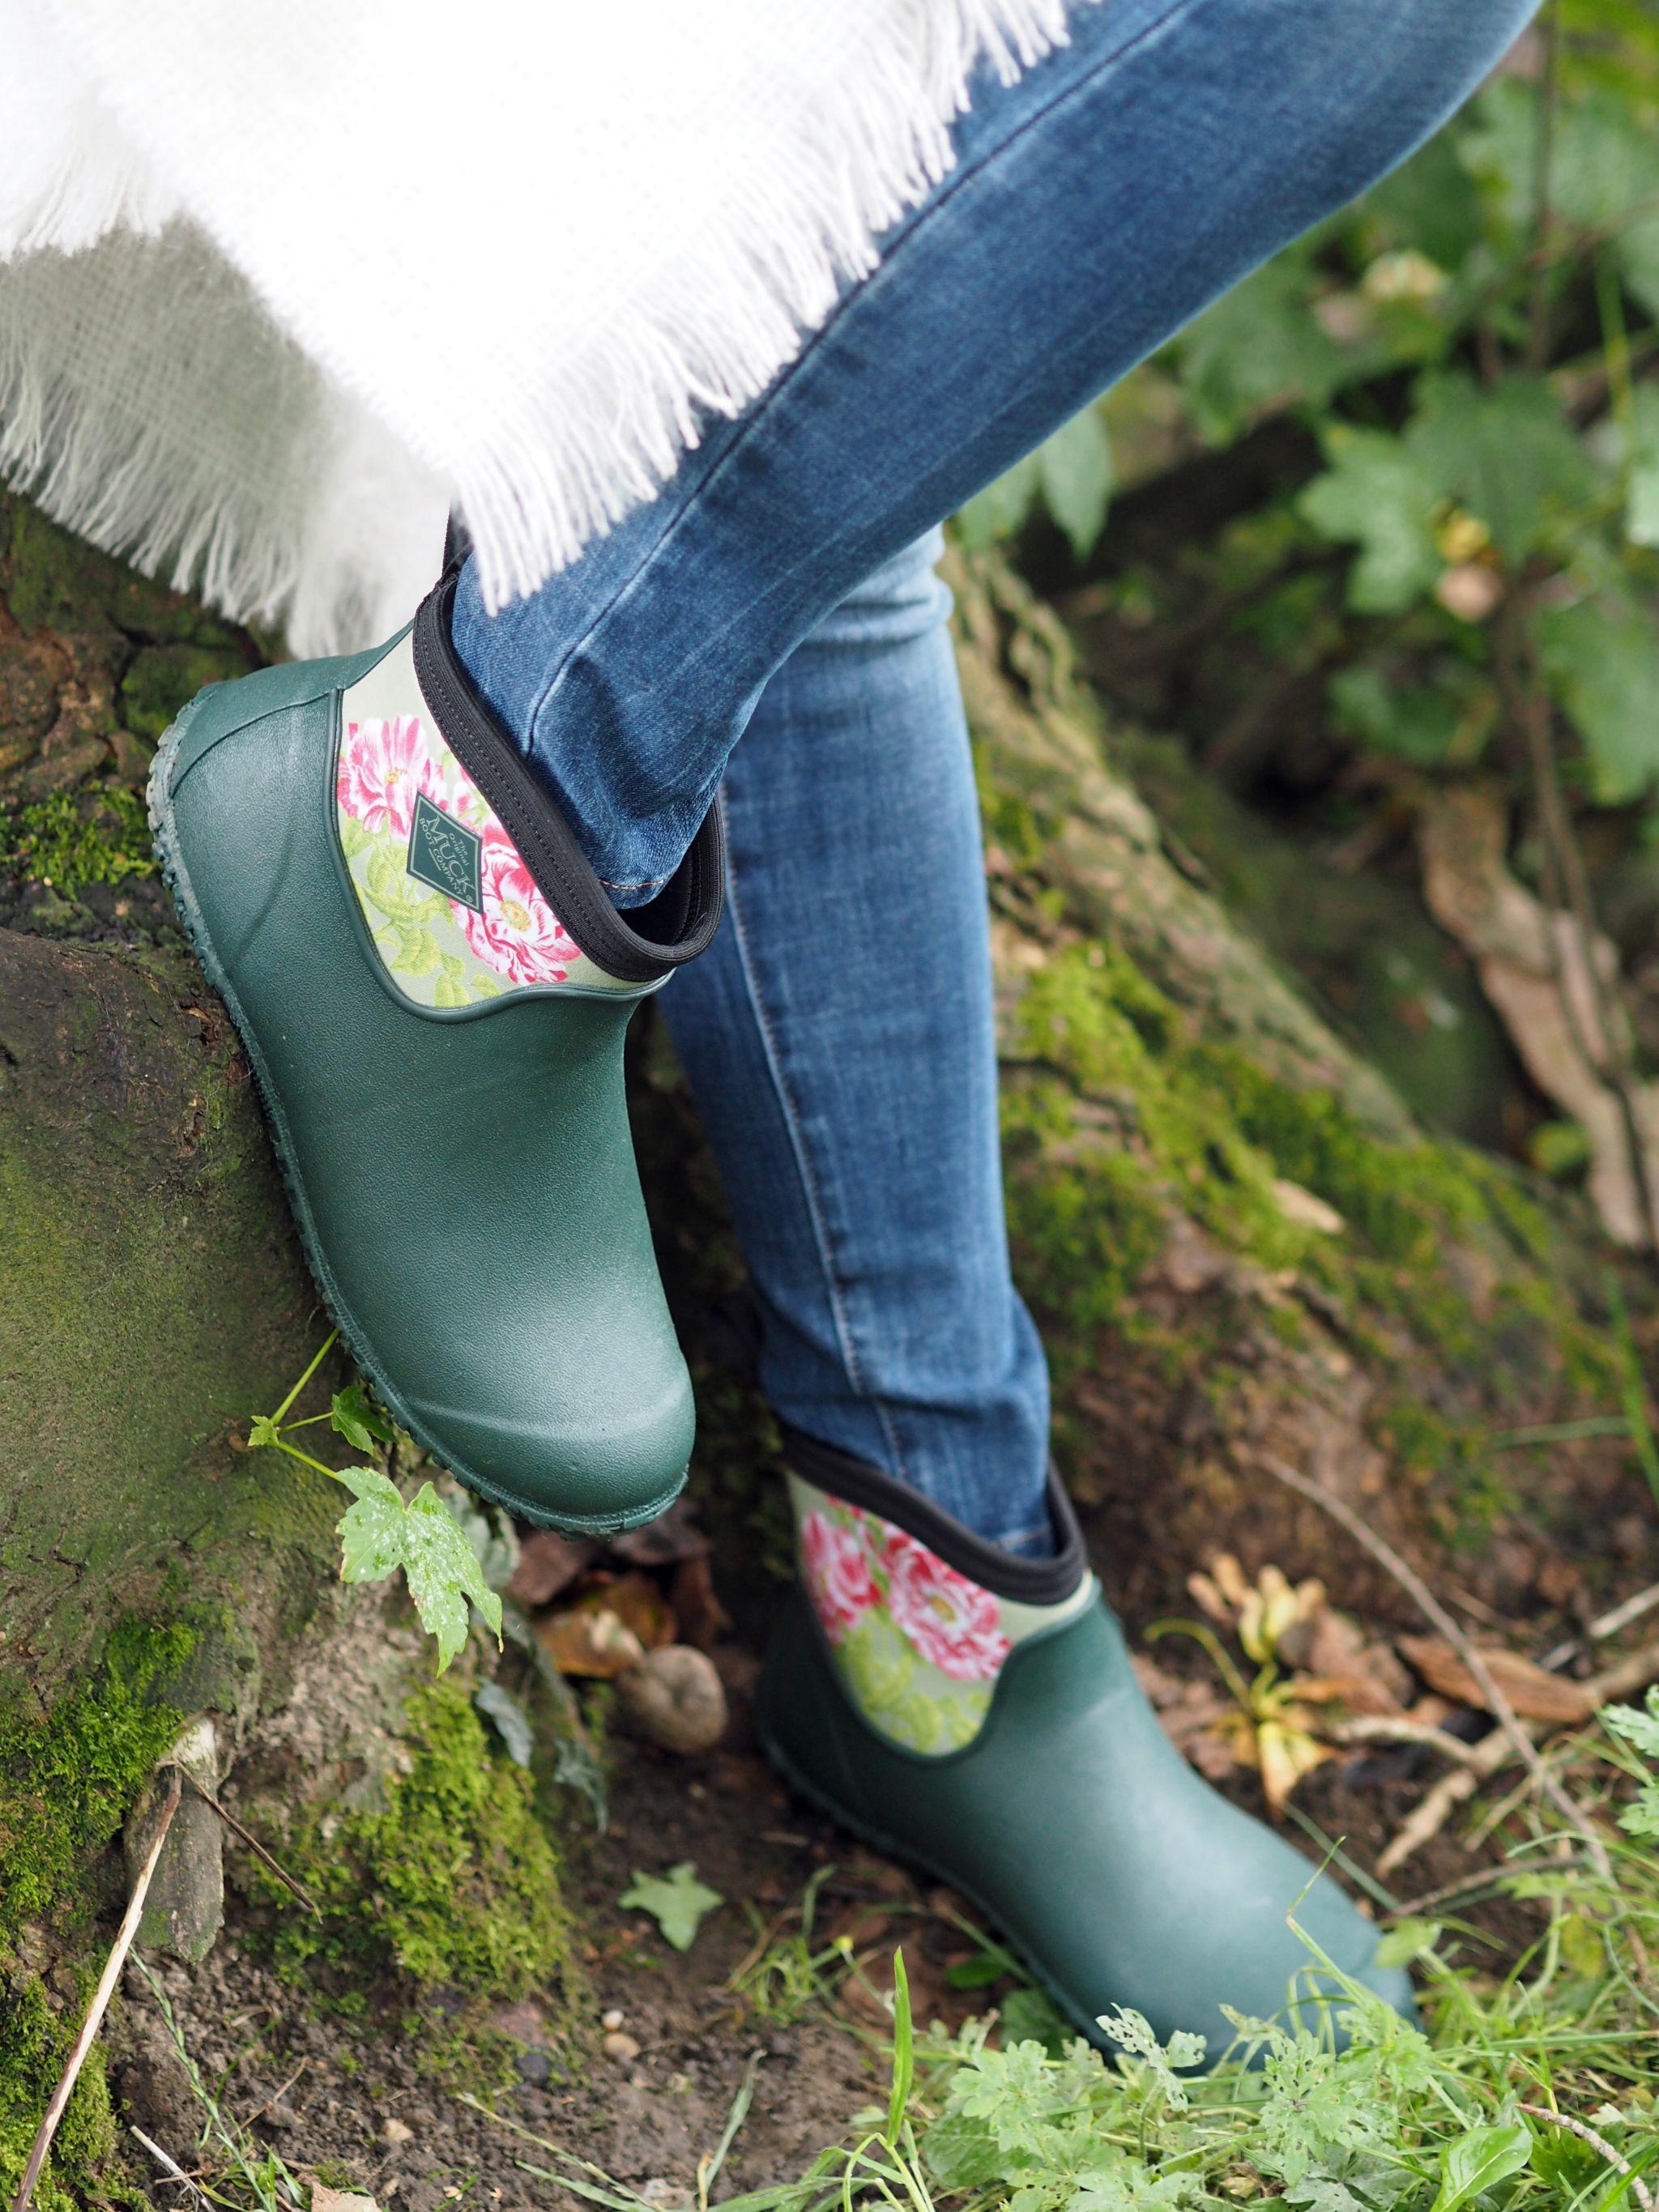 what-lizzy-loves-cream-mohair-serape-jeans-short-green-wellies-wellingtons-muck-boots